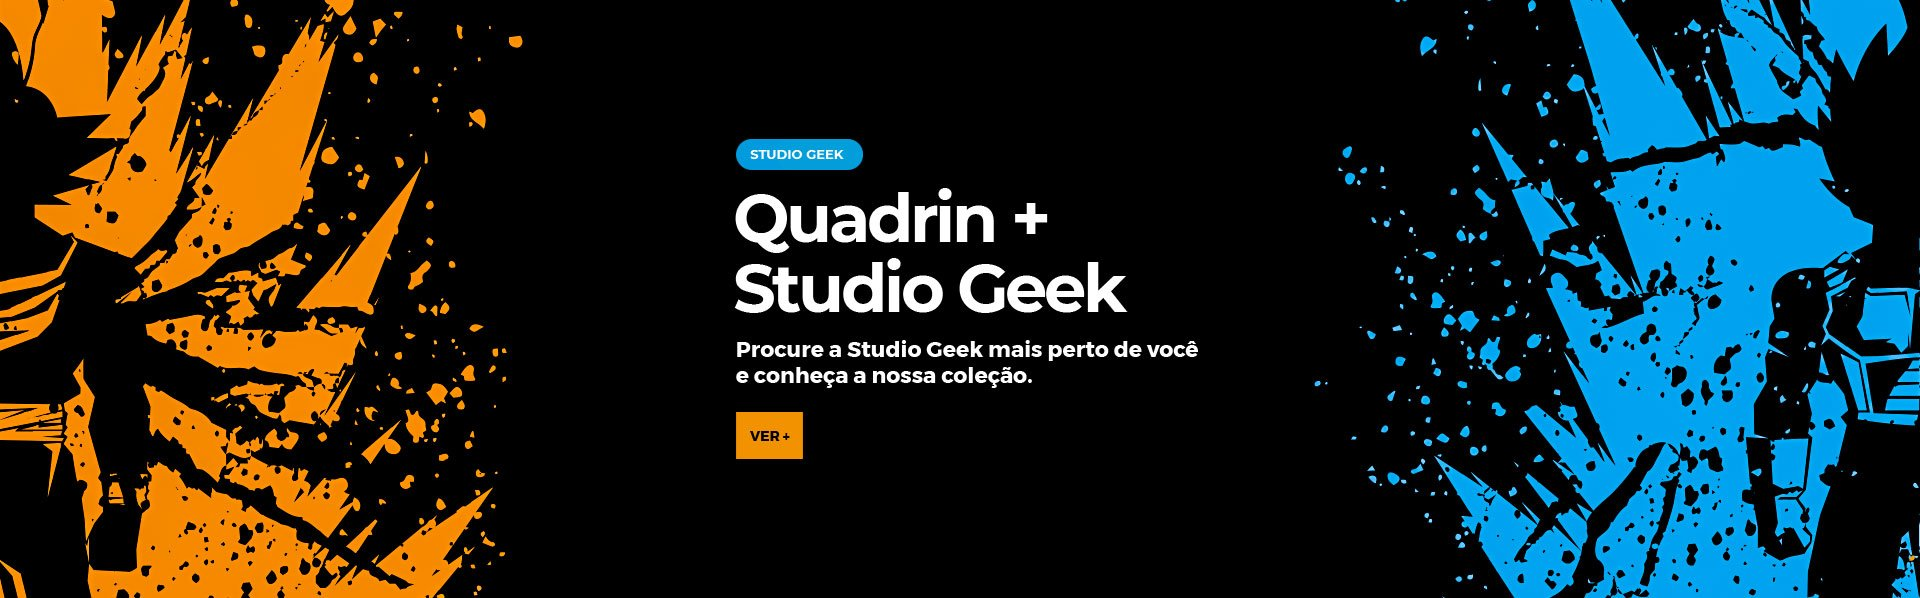 Studio Geek - Sayajin